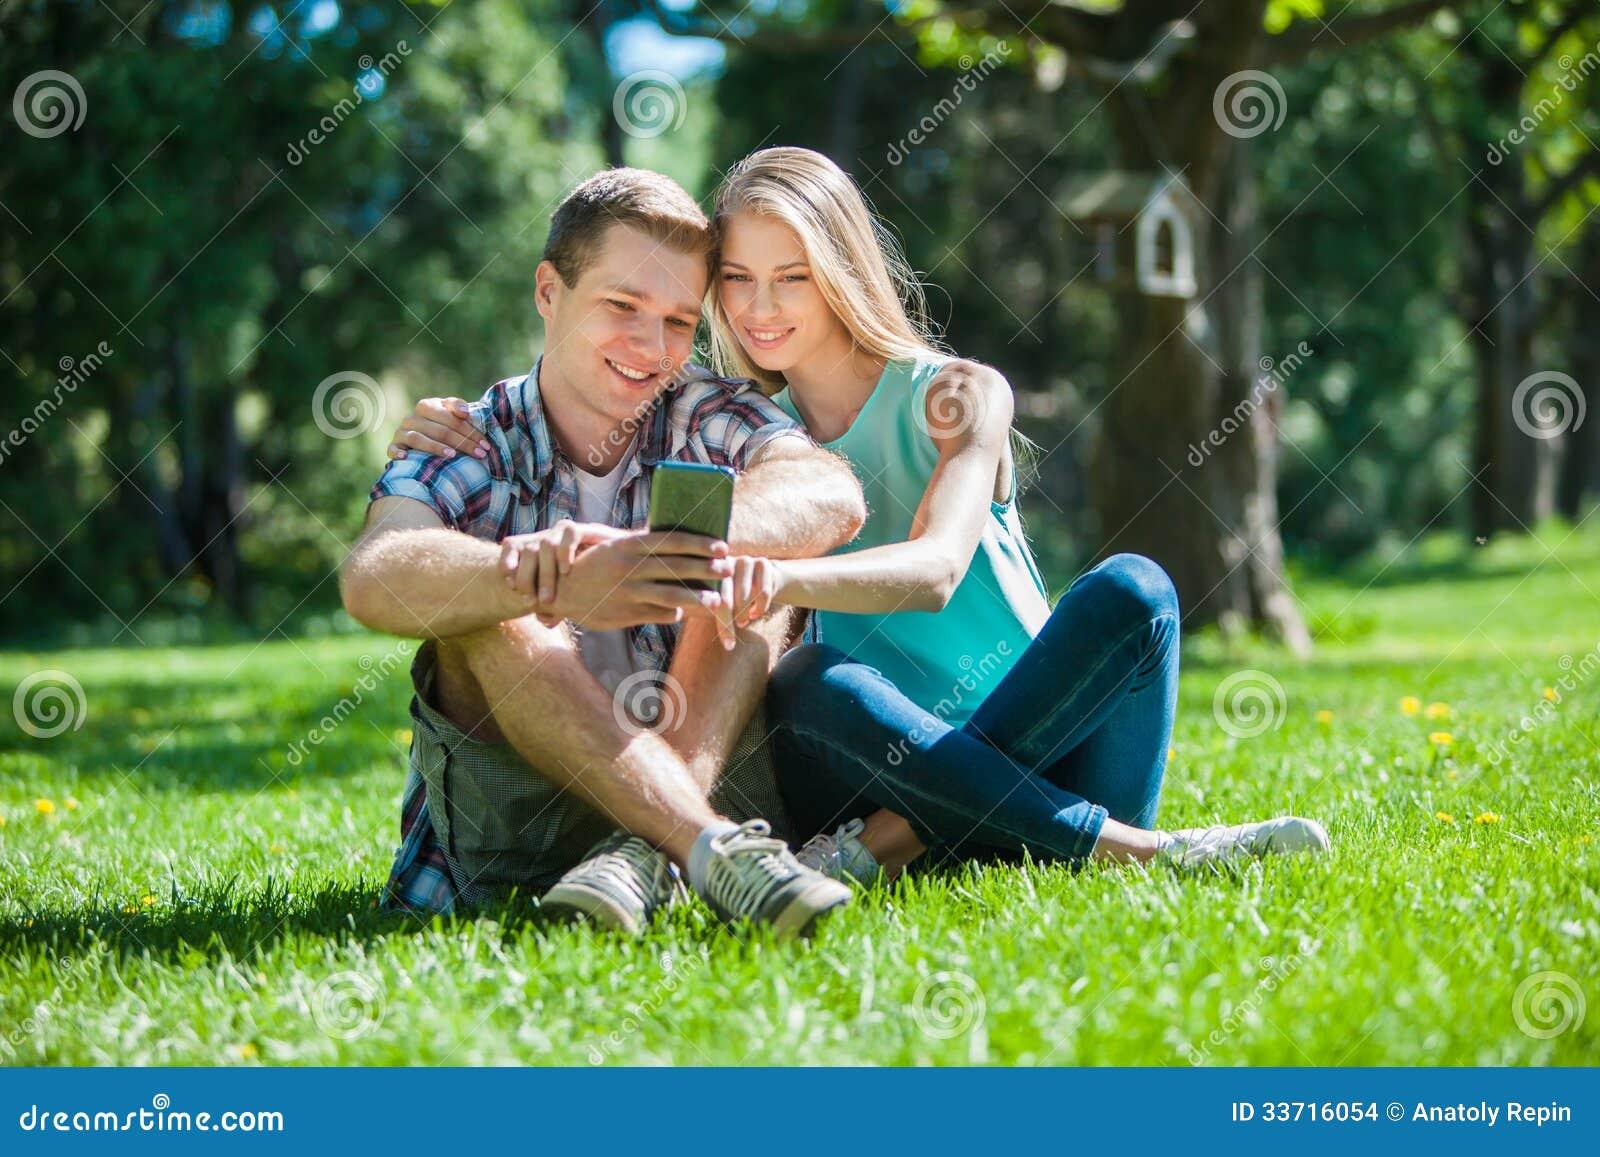 datemyschool.com read more: https://www.lovedignity.com/top-20-best-free-online-dating-sites/